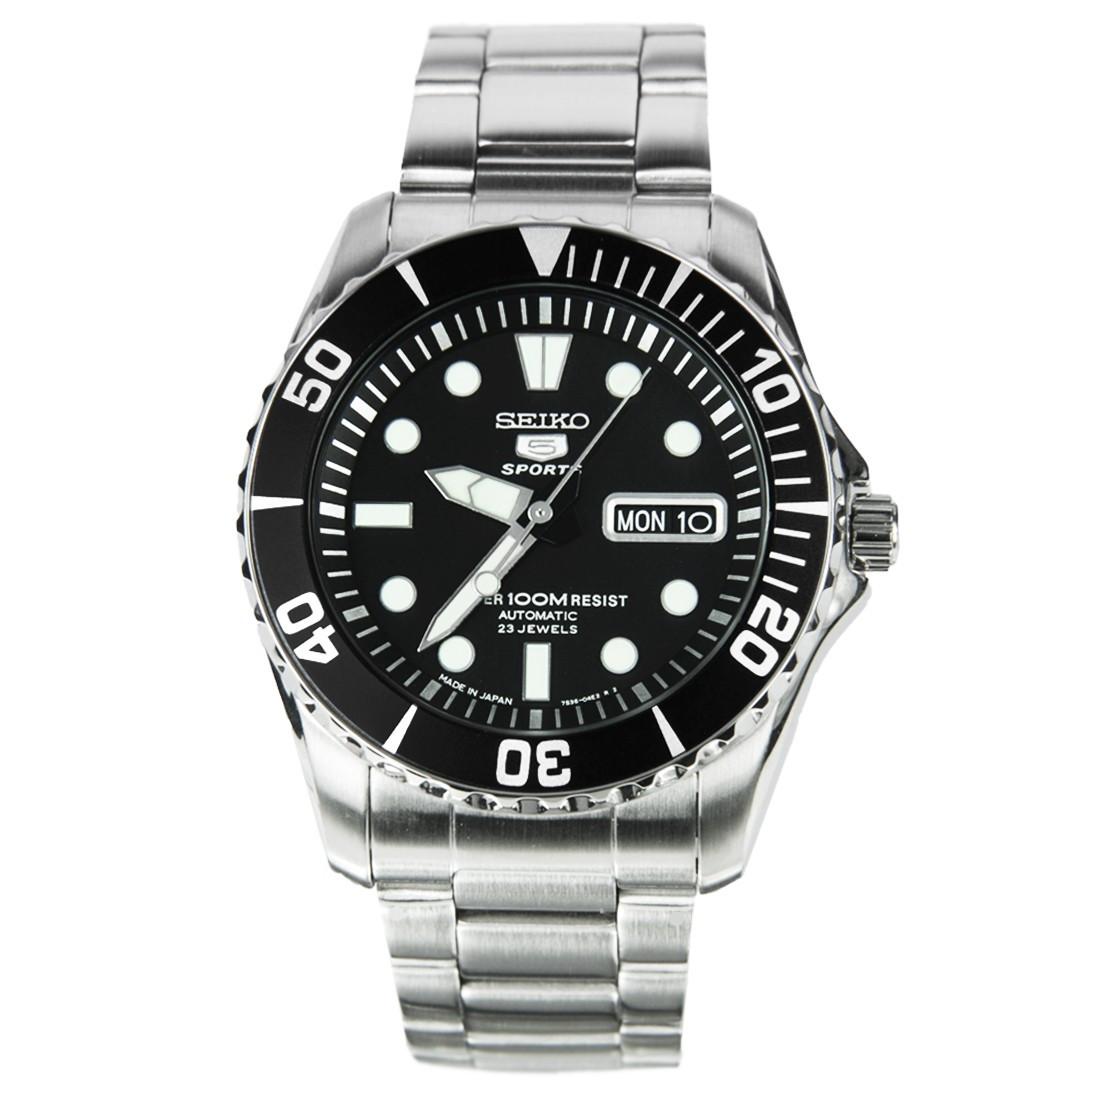 Часы Seiko SNZF17J1 Automatic 7S36